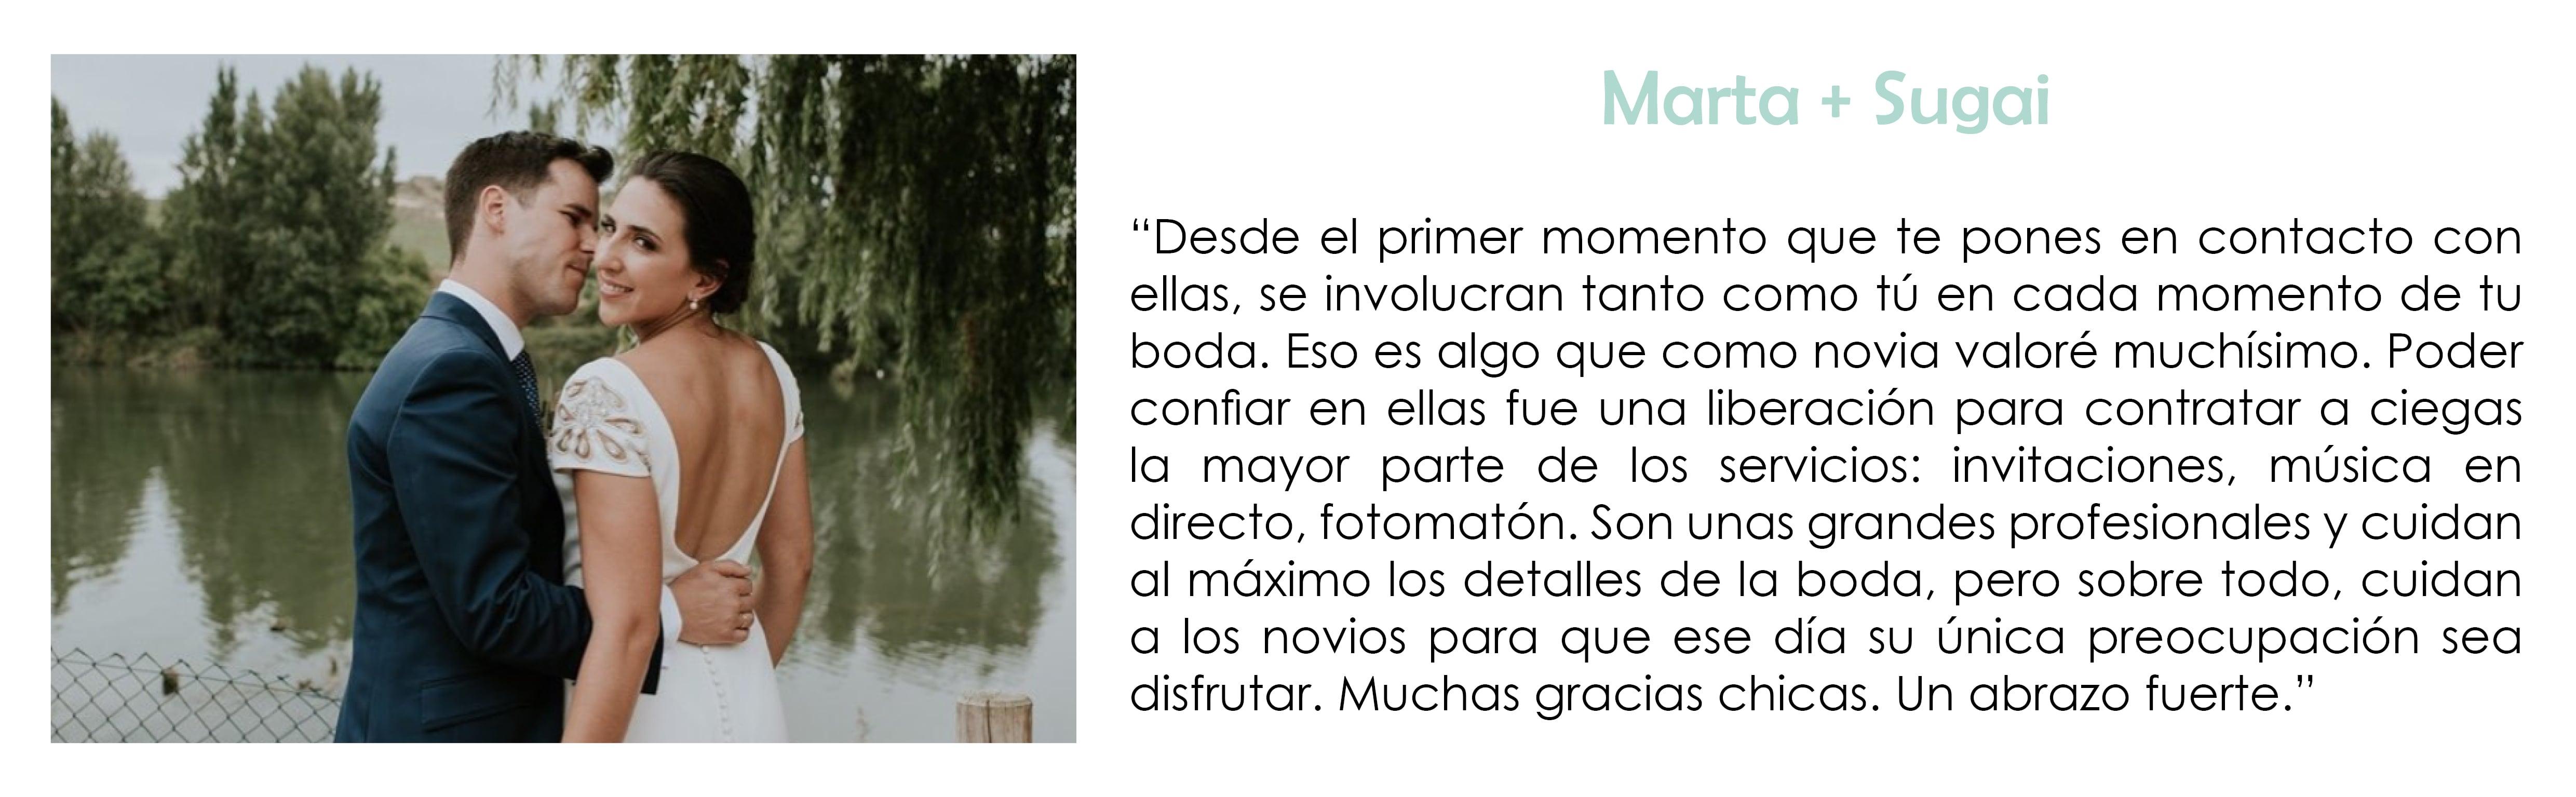 RESEÑAS4-min